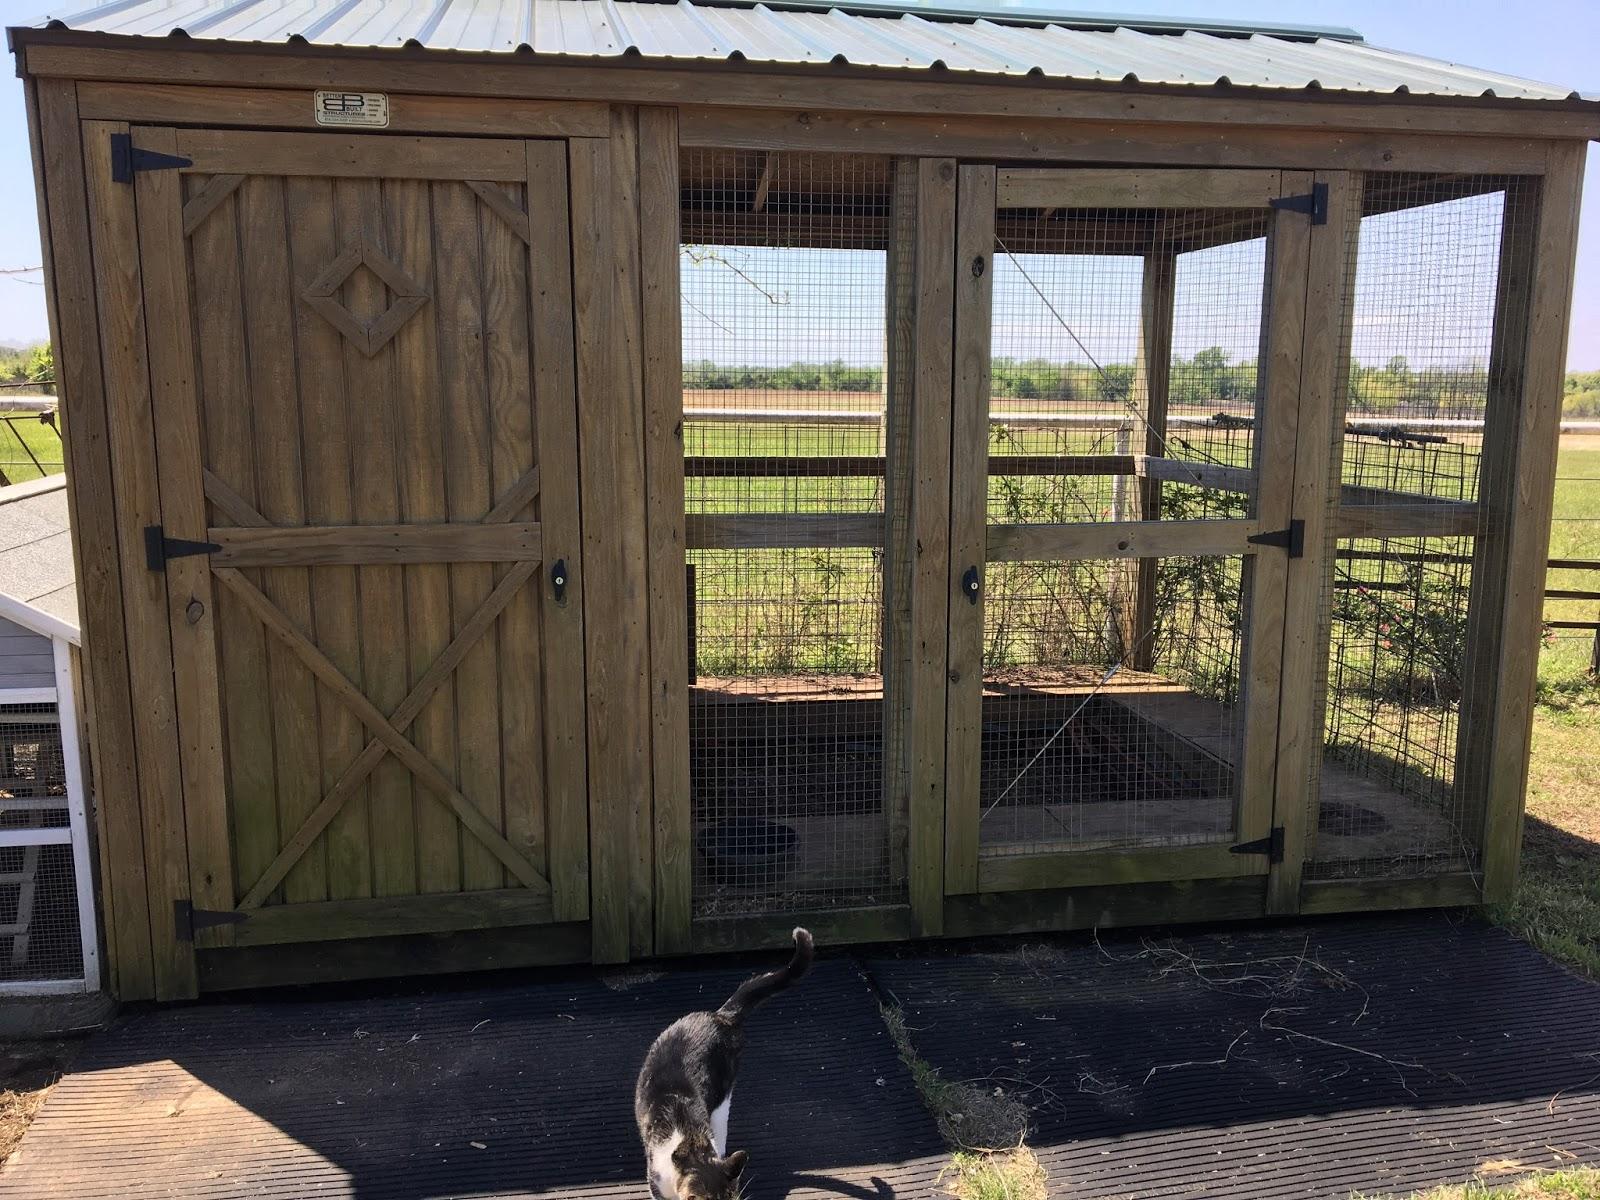 surrey hills farm: big chicks now??